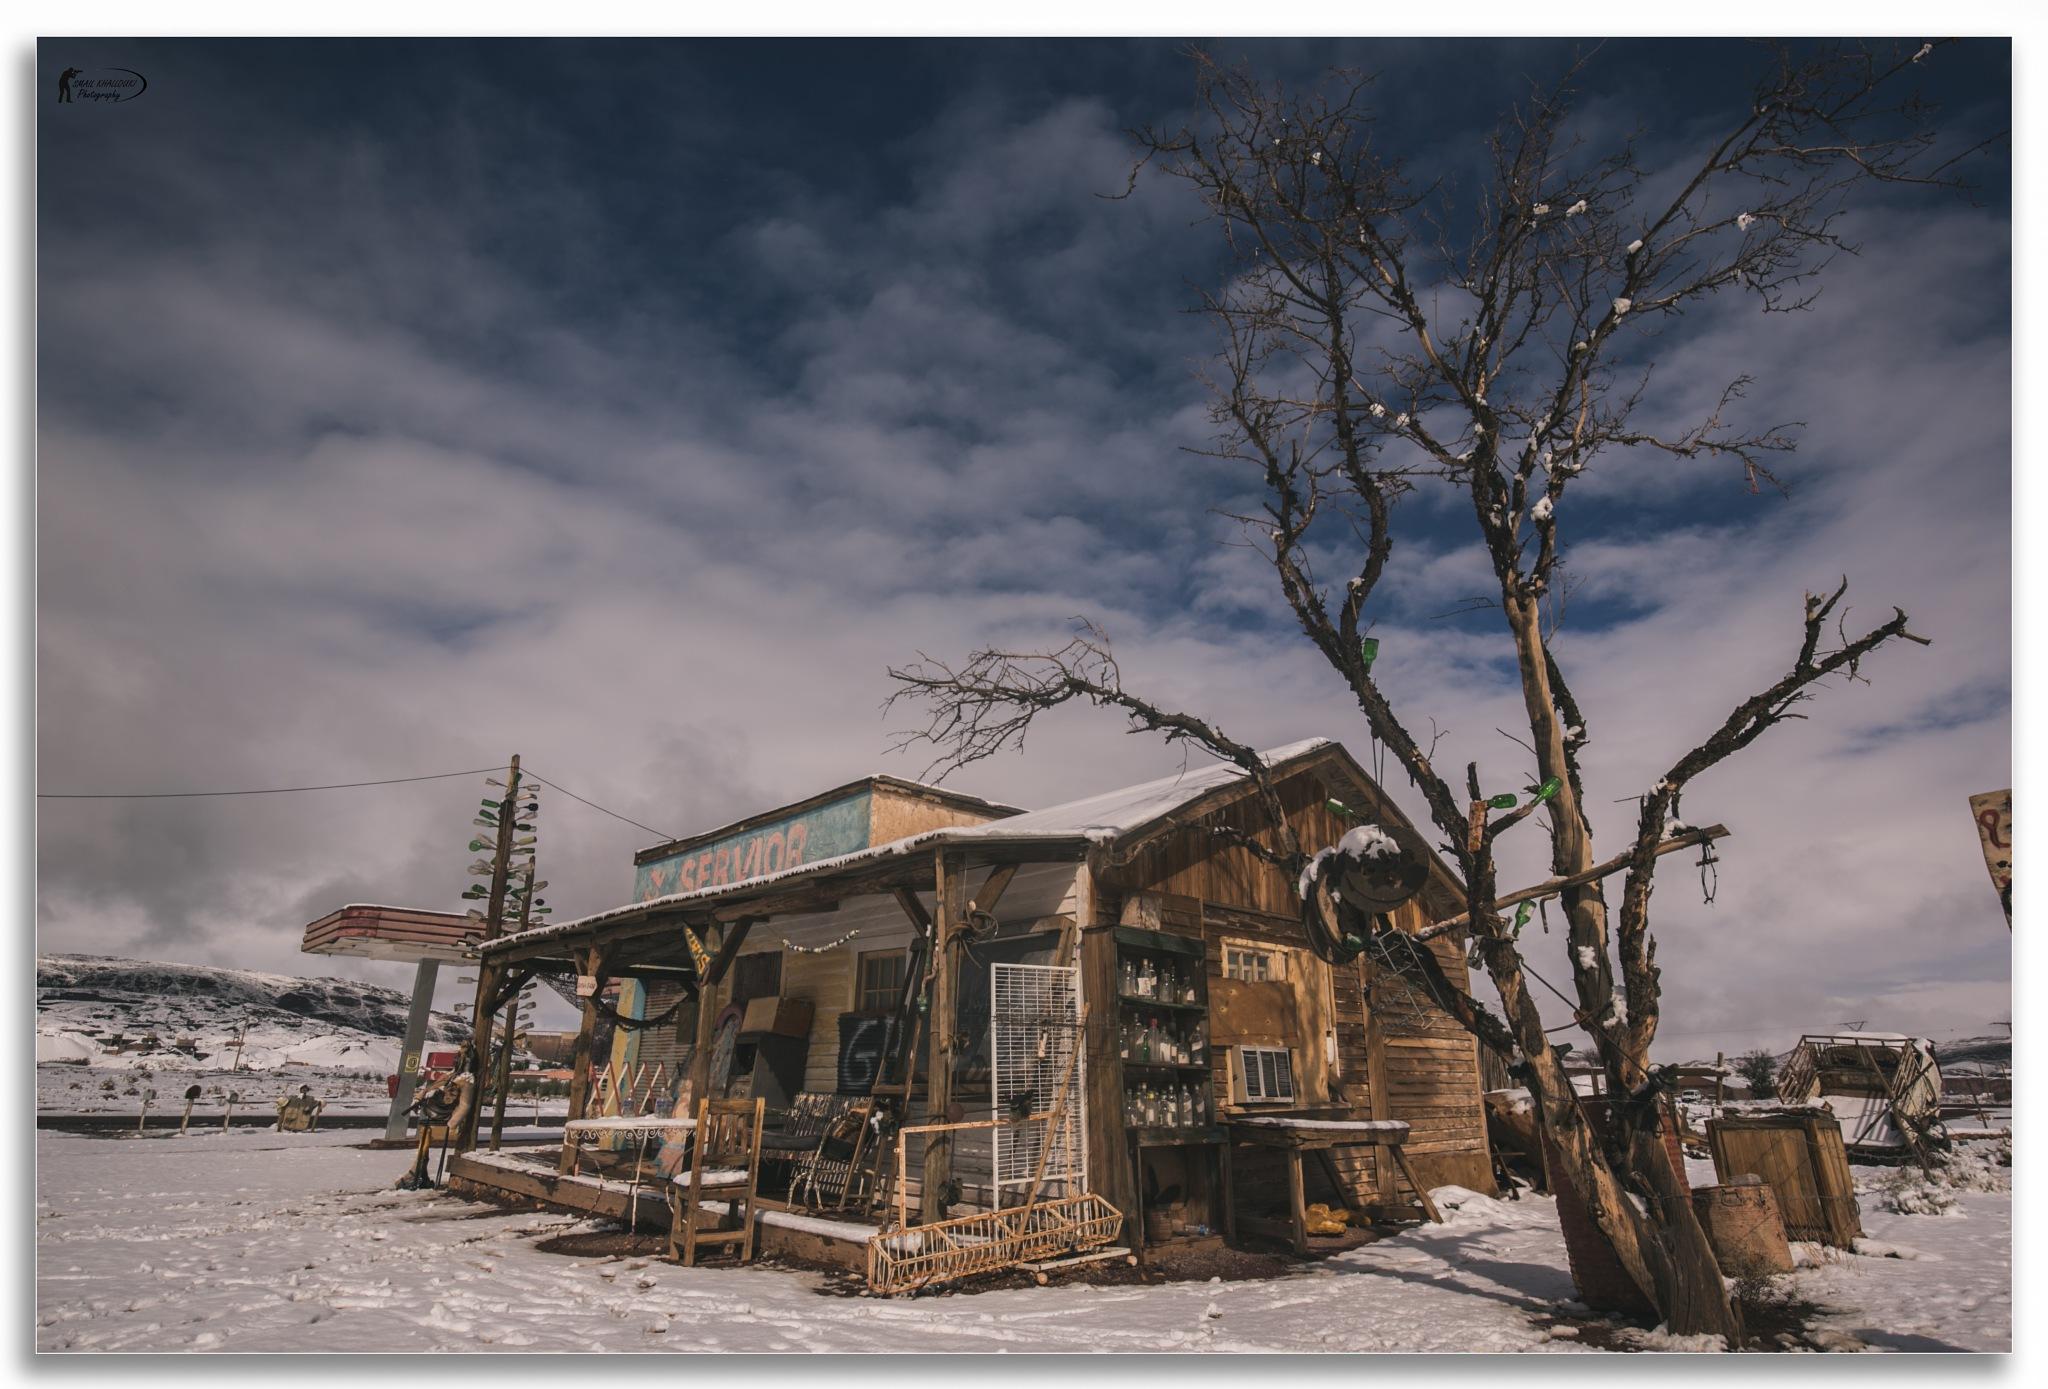 gas haven station by Ismail Khallouki